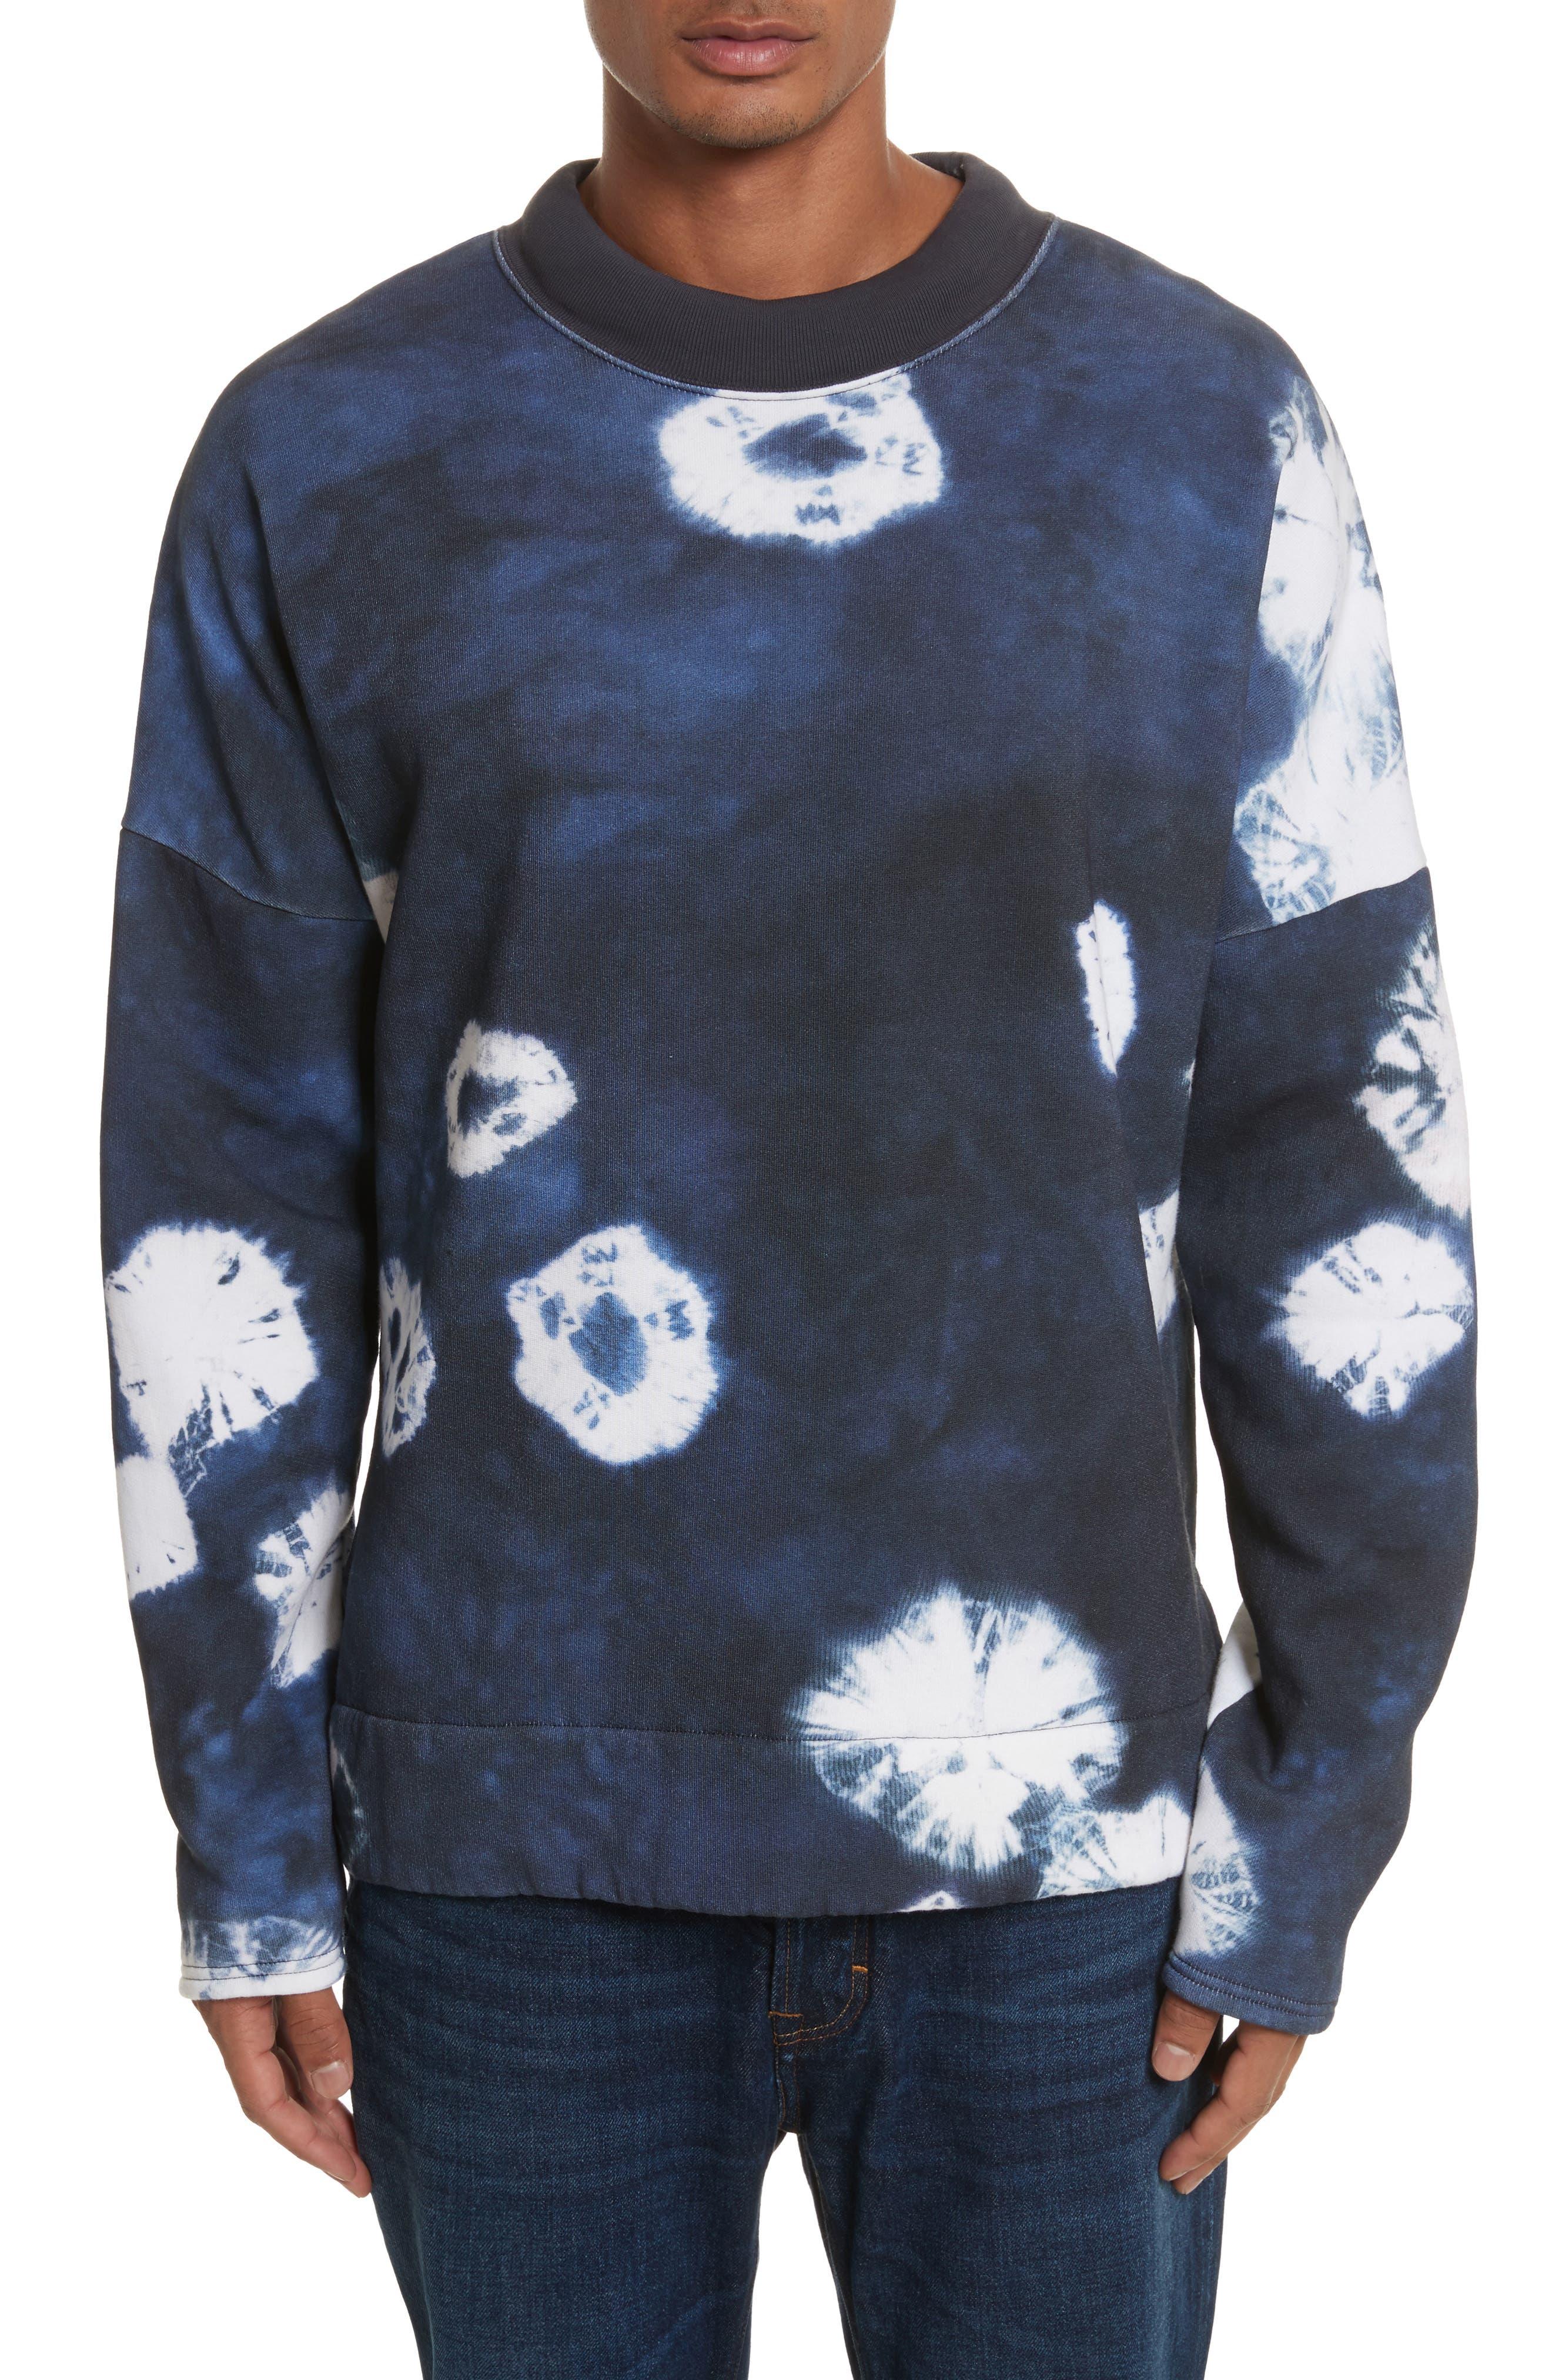 Fellke Bleach Indigo Sweatshirt,                             Main thumbnail 1, color,                             410